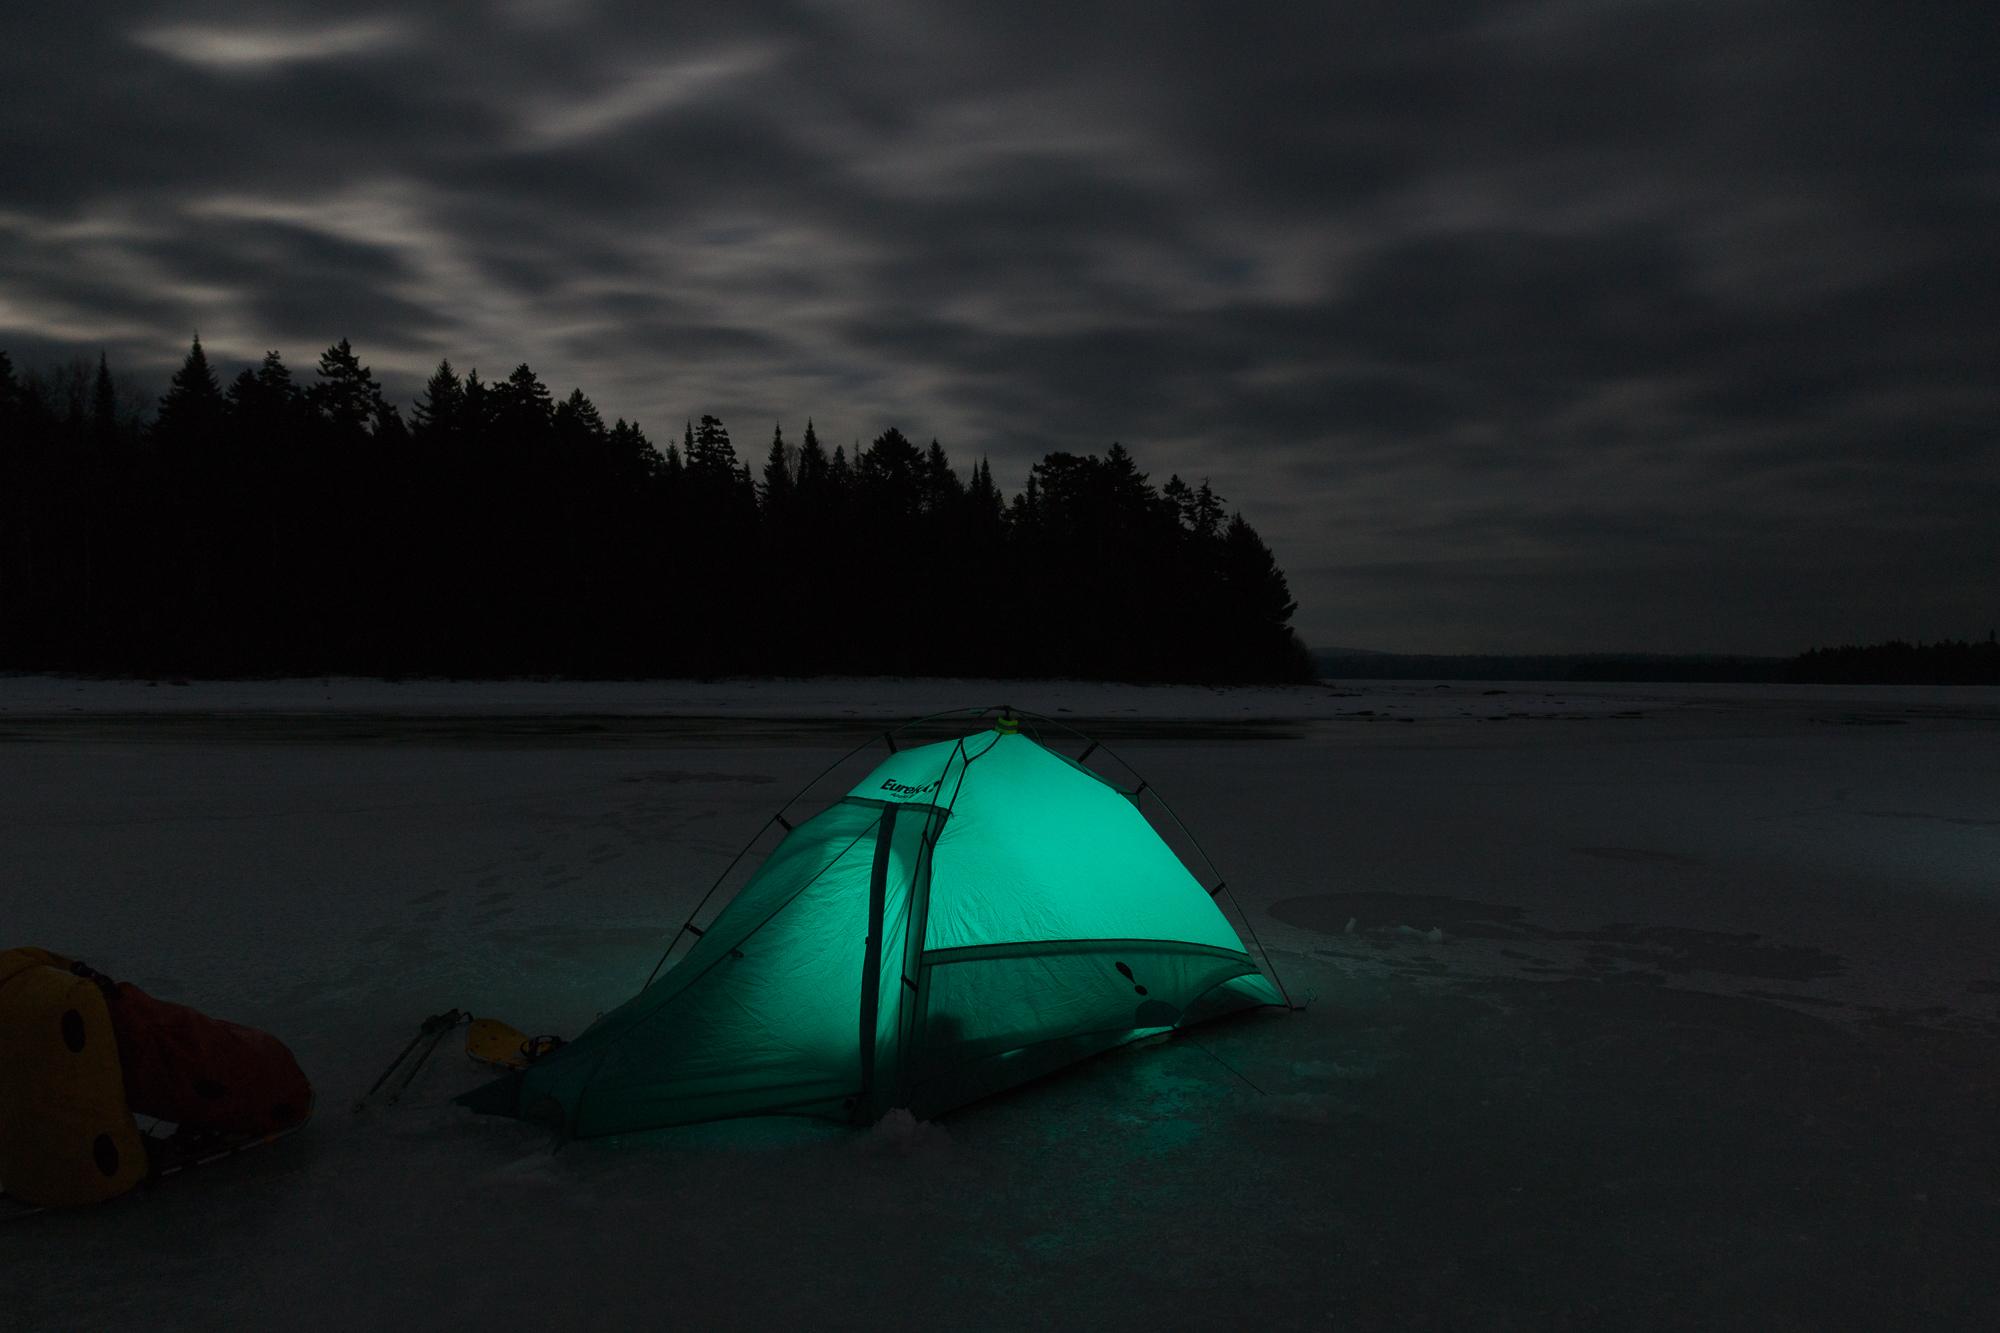 Troscianiec night tent on ice photo-06167.JPG